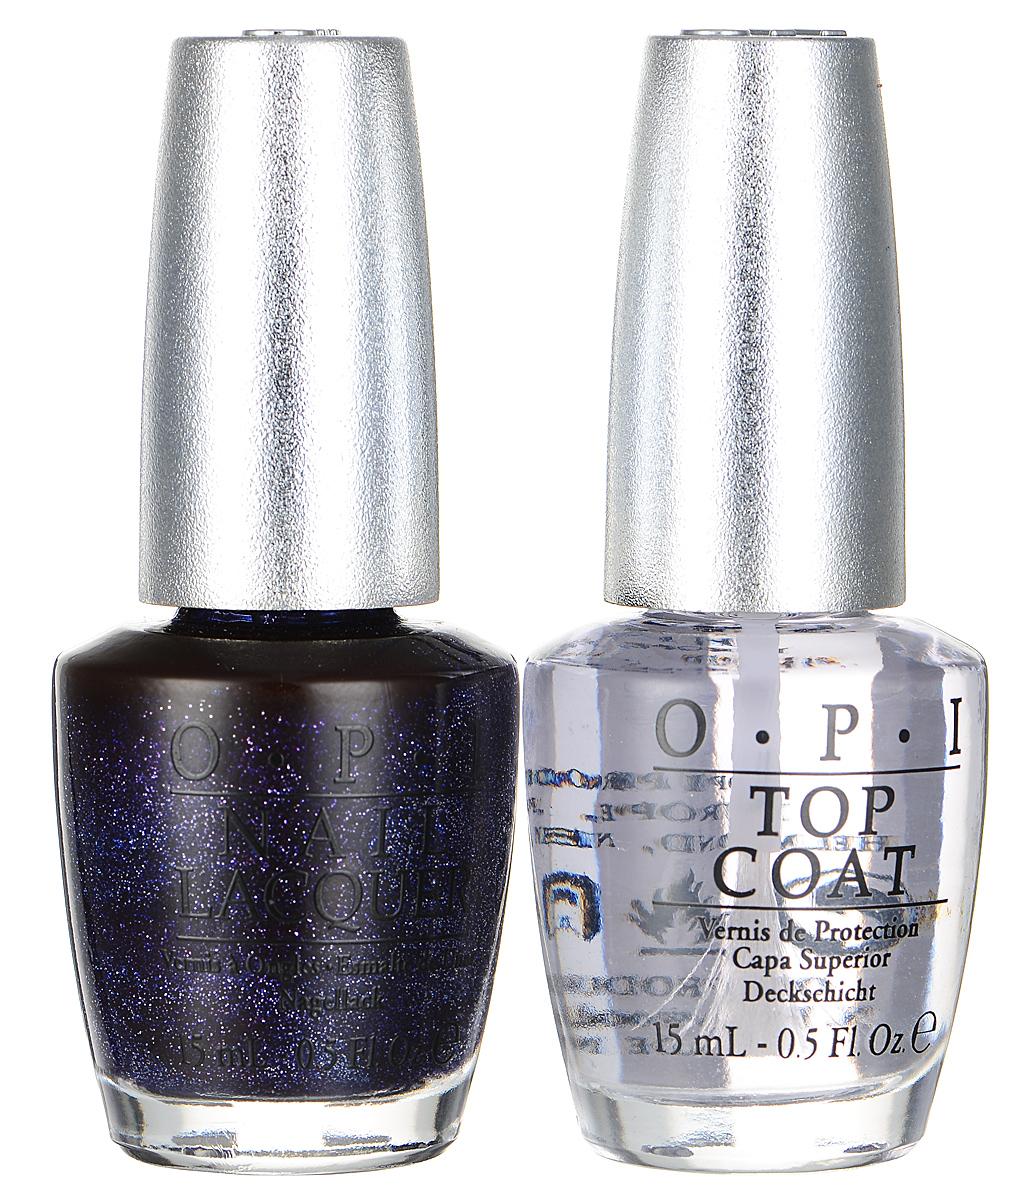 OPI Набор Lapis Duo Pack: лак для ногтей, тон DS Lapis, верхнее покрытие Top Coat Designer Series, 2 х 15 мл